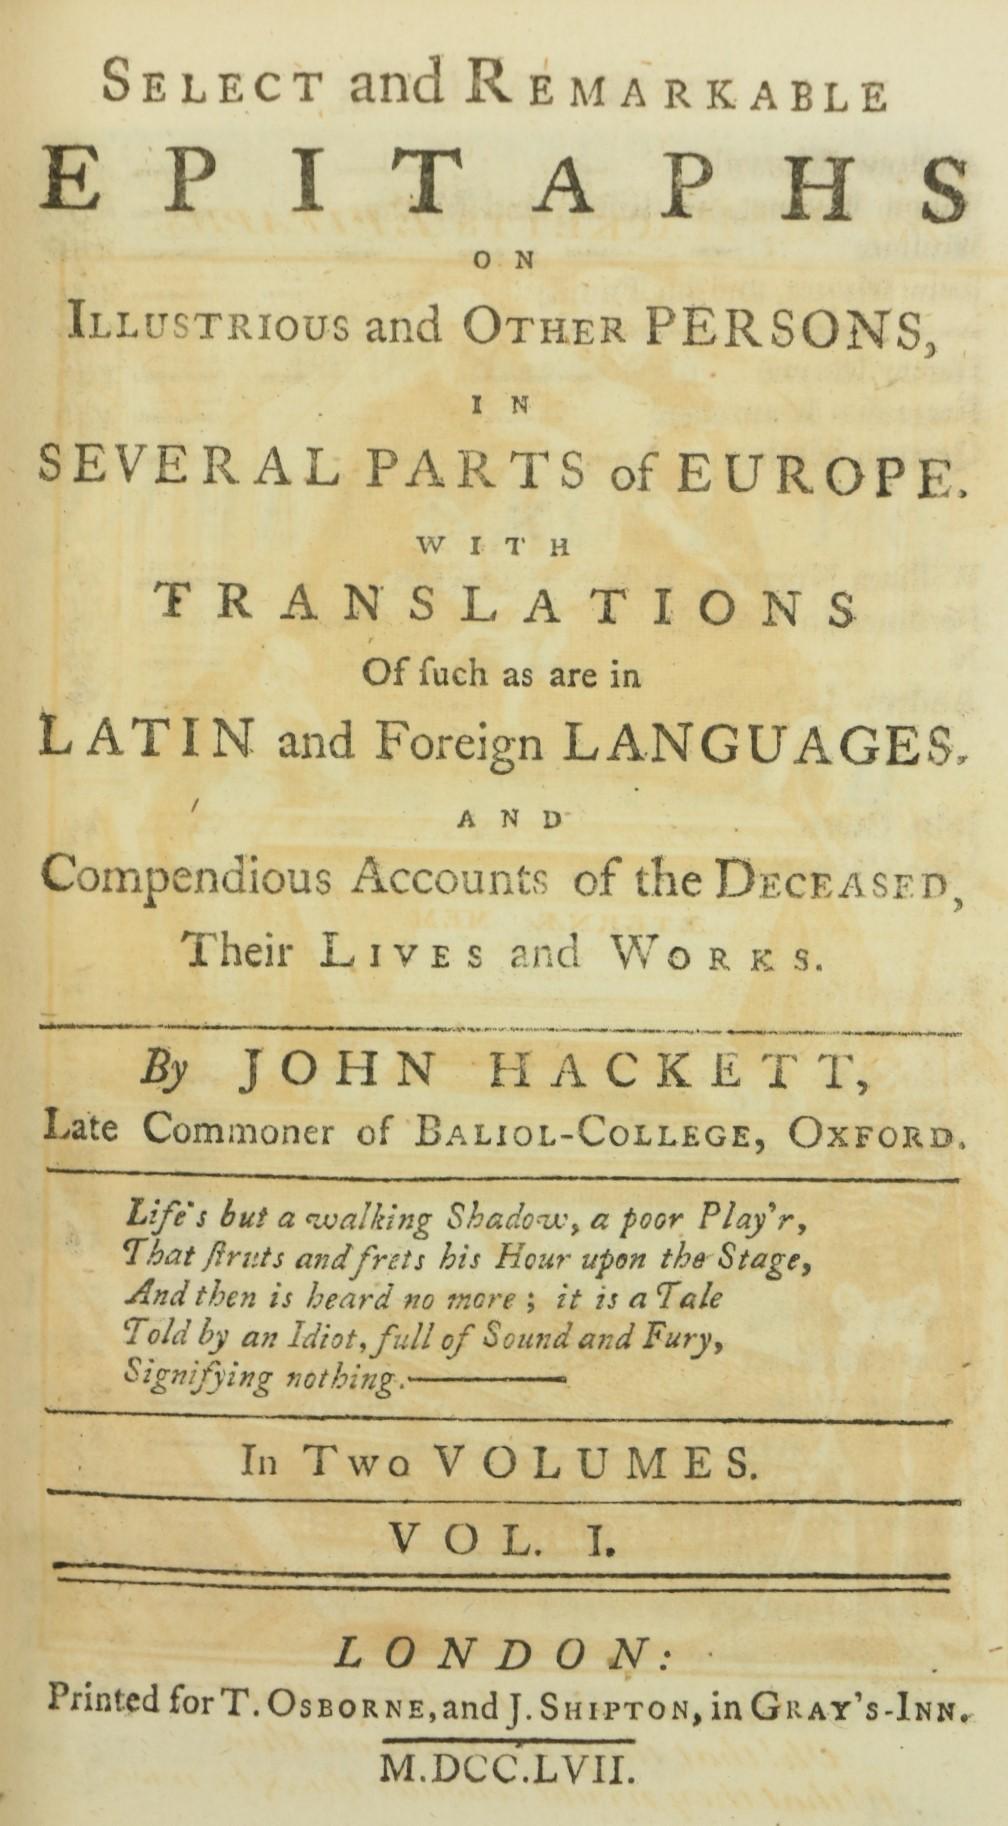 [Brydges (Thos.)]ÿA Burlesque Translationÿof Homer, 2 vols. 12mo L. 1770.ÿThird Edn.,ÿ2 engd. - Image 3 of 4